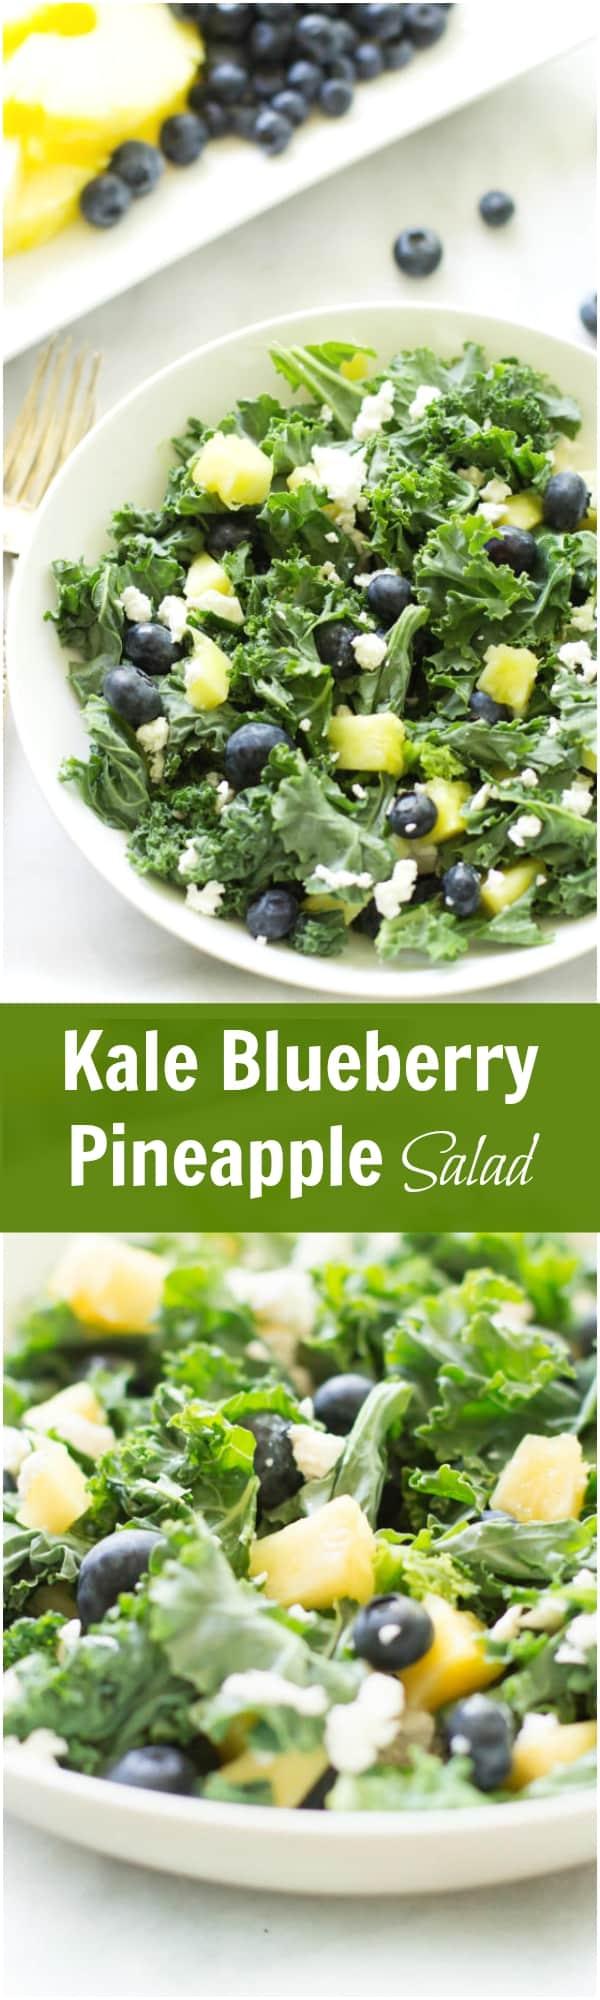 Kale Blueberry Pineapple Salad - Kale blueberry pineapple salad is sweet, tart, and full of vitamins.